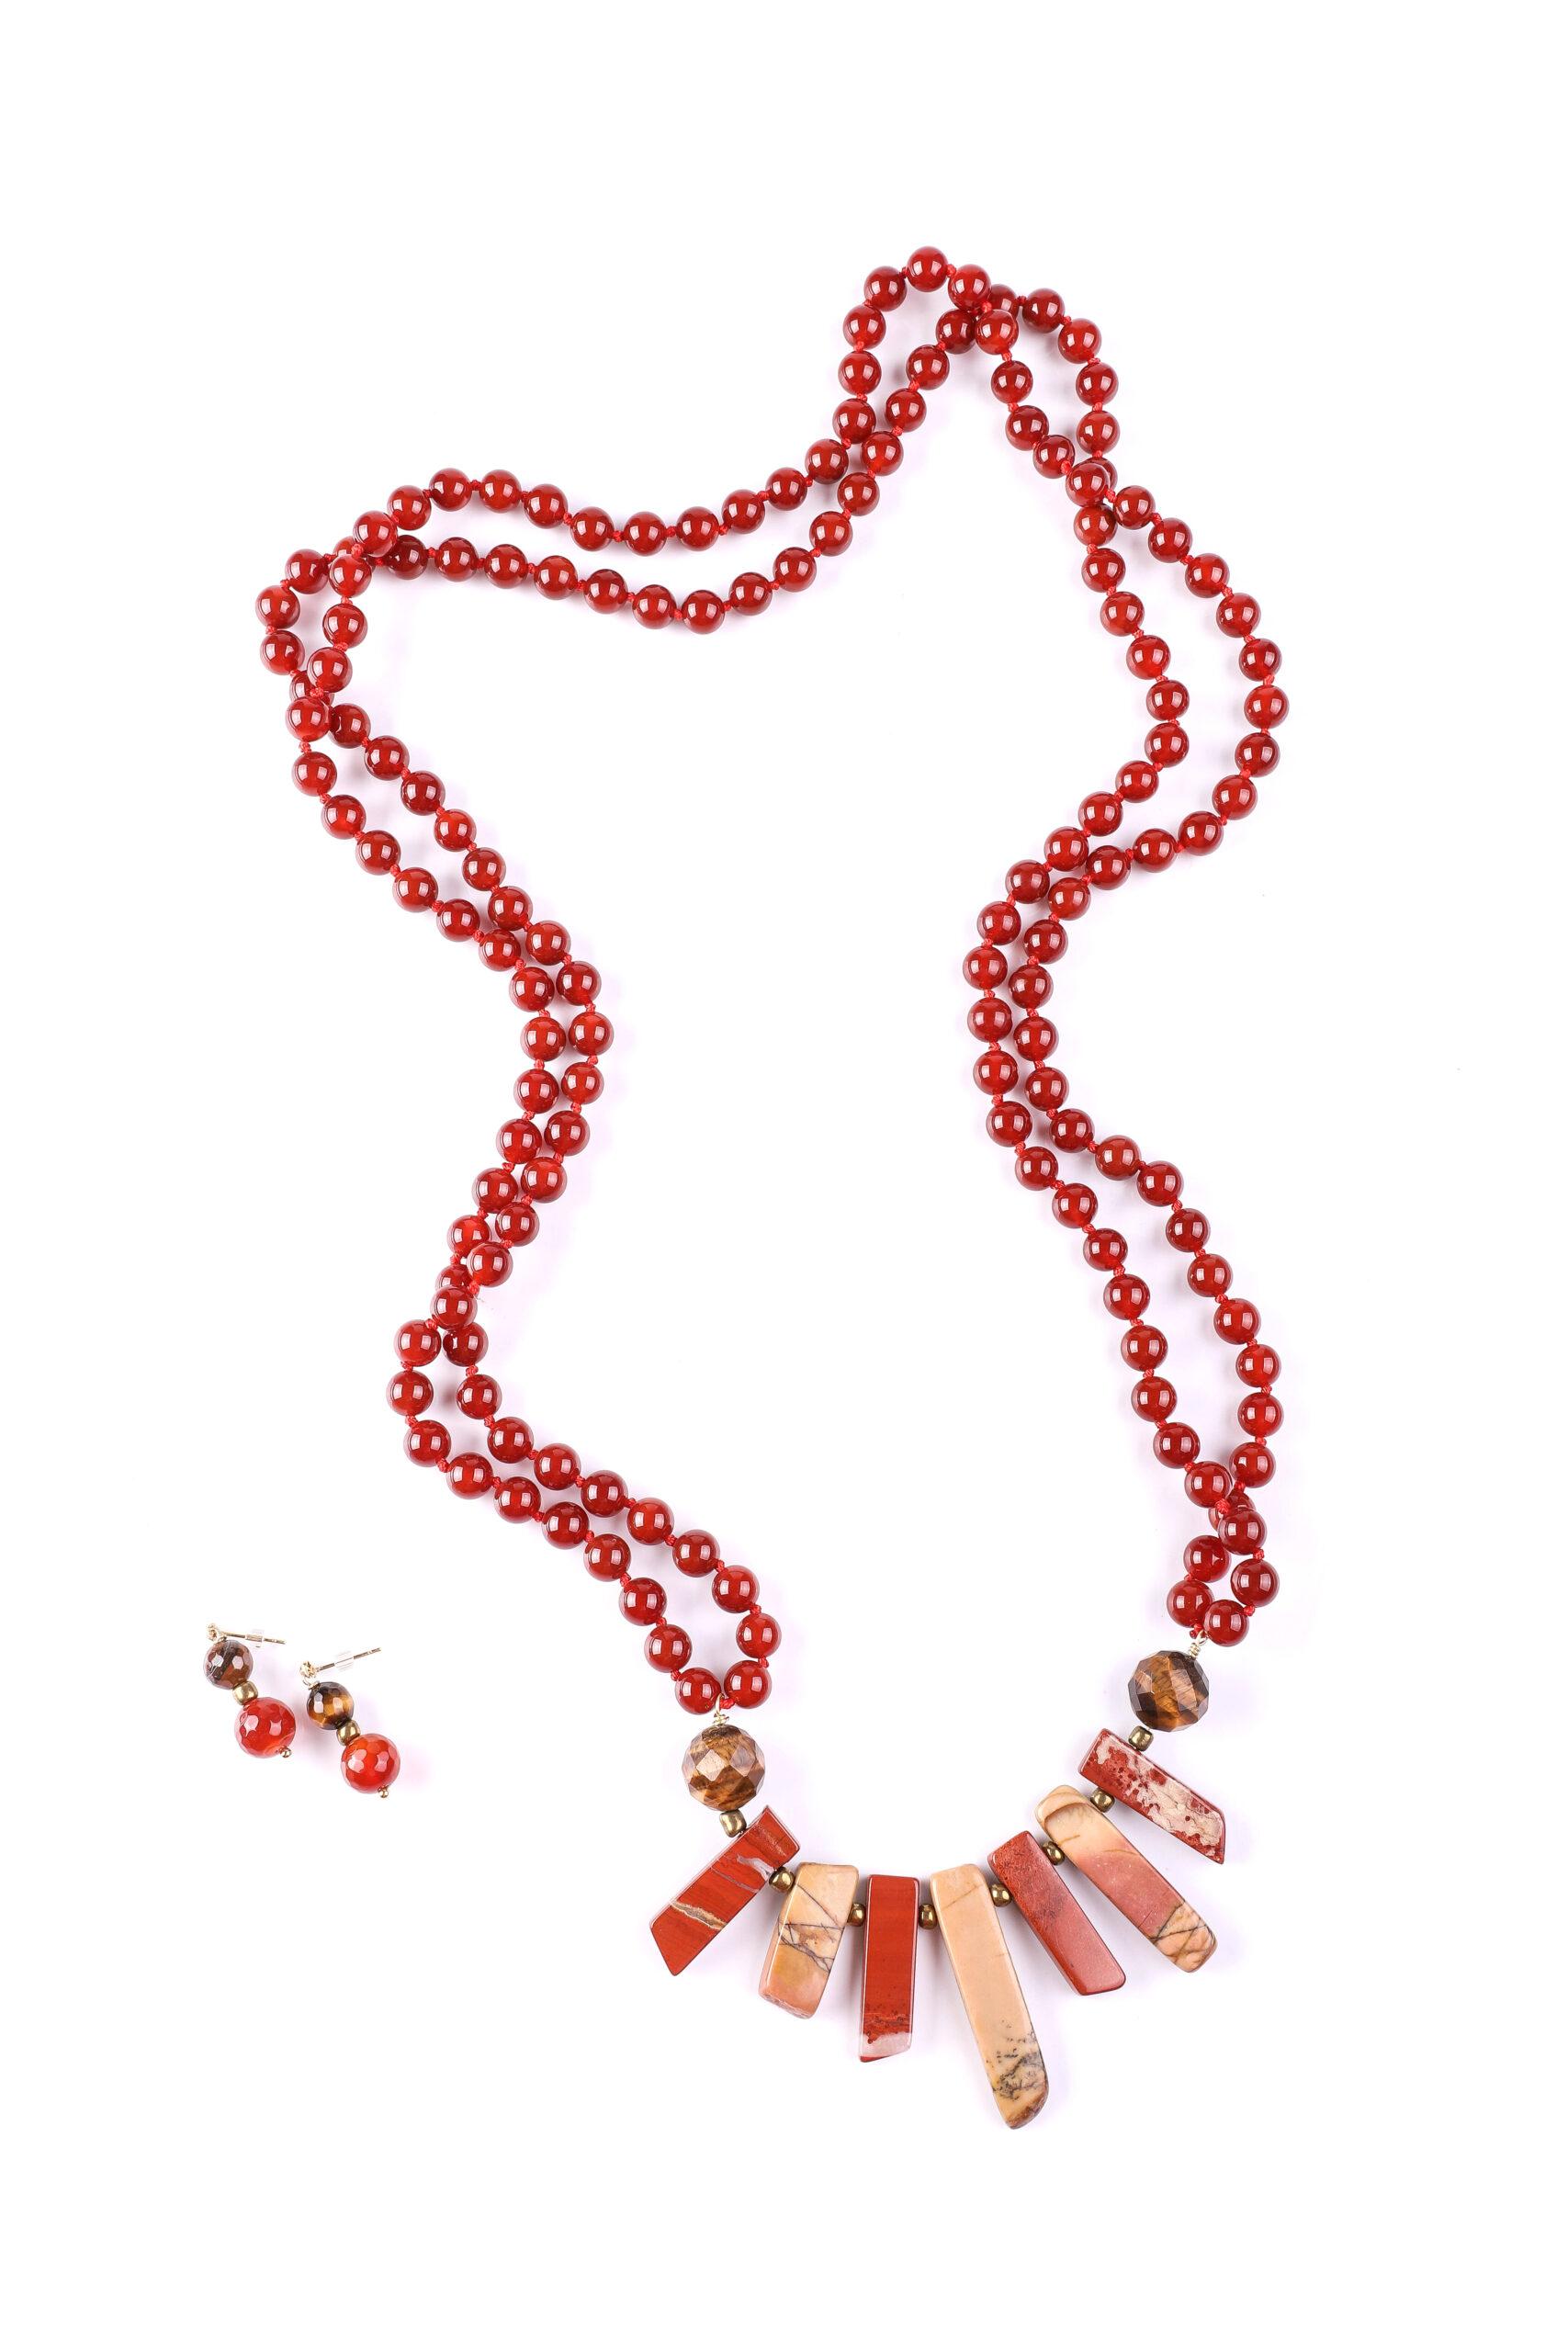 estalactitas-a256-osaya-joyas-artesanales-mexico